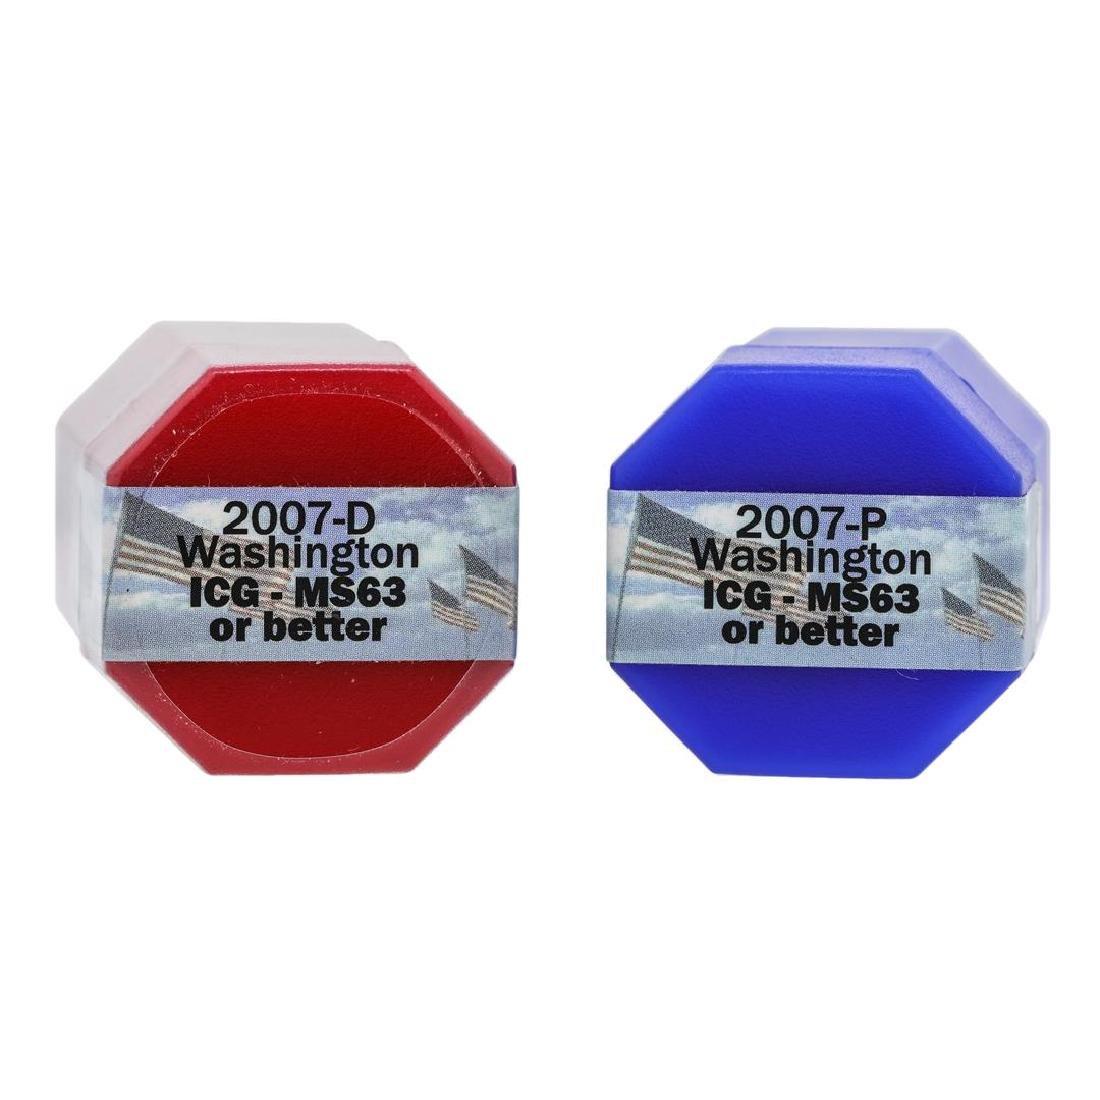 Rolls of 2007-D & 2007-P $1 George Washington